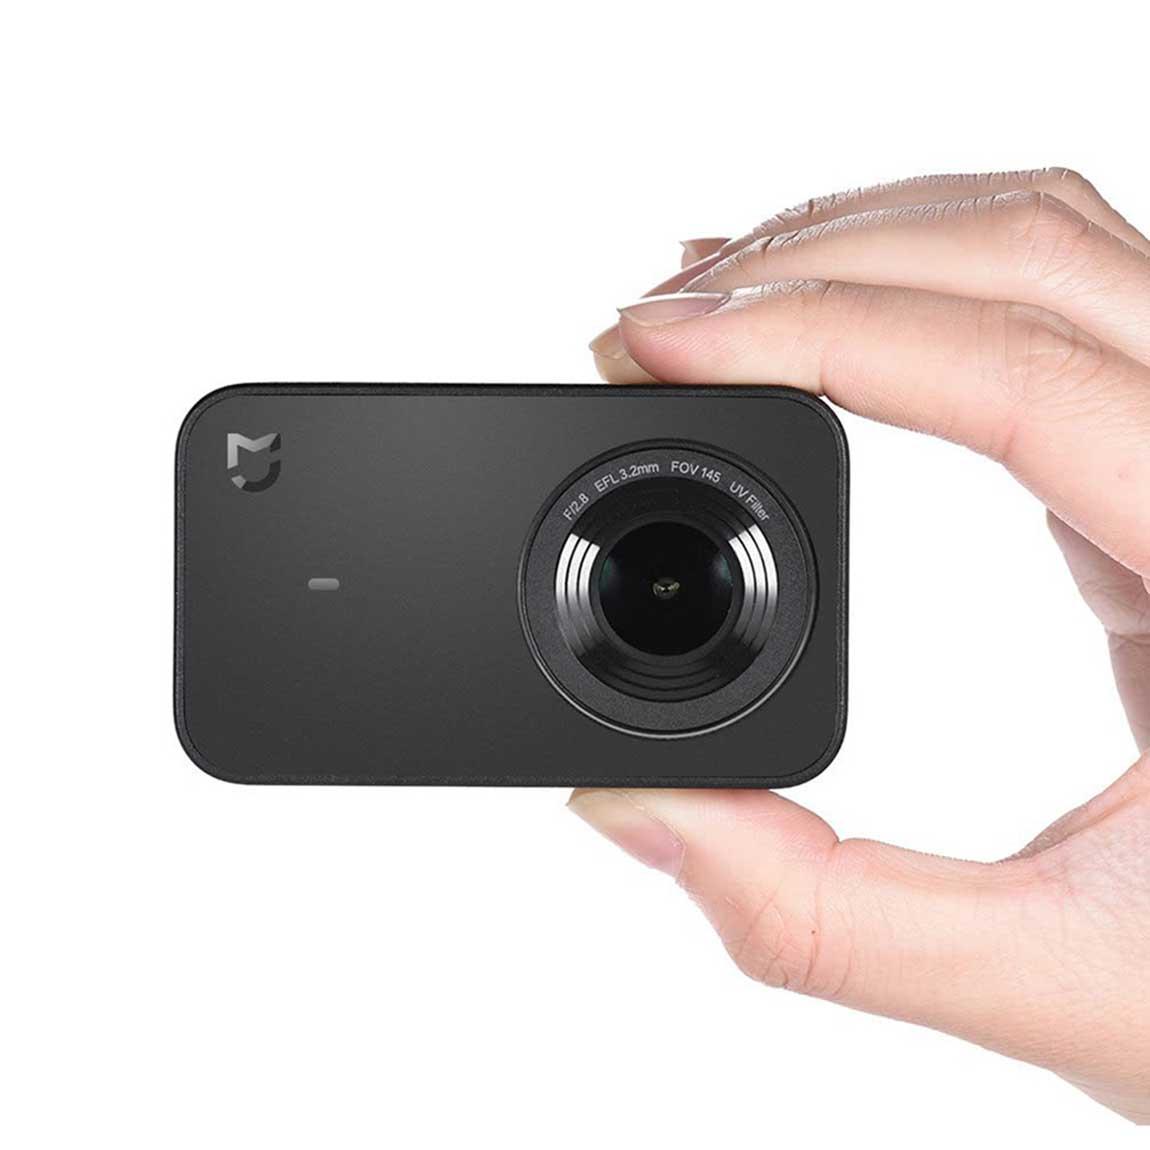 Xiaomi 4k Action Camera In Bangladesh At Best Price